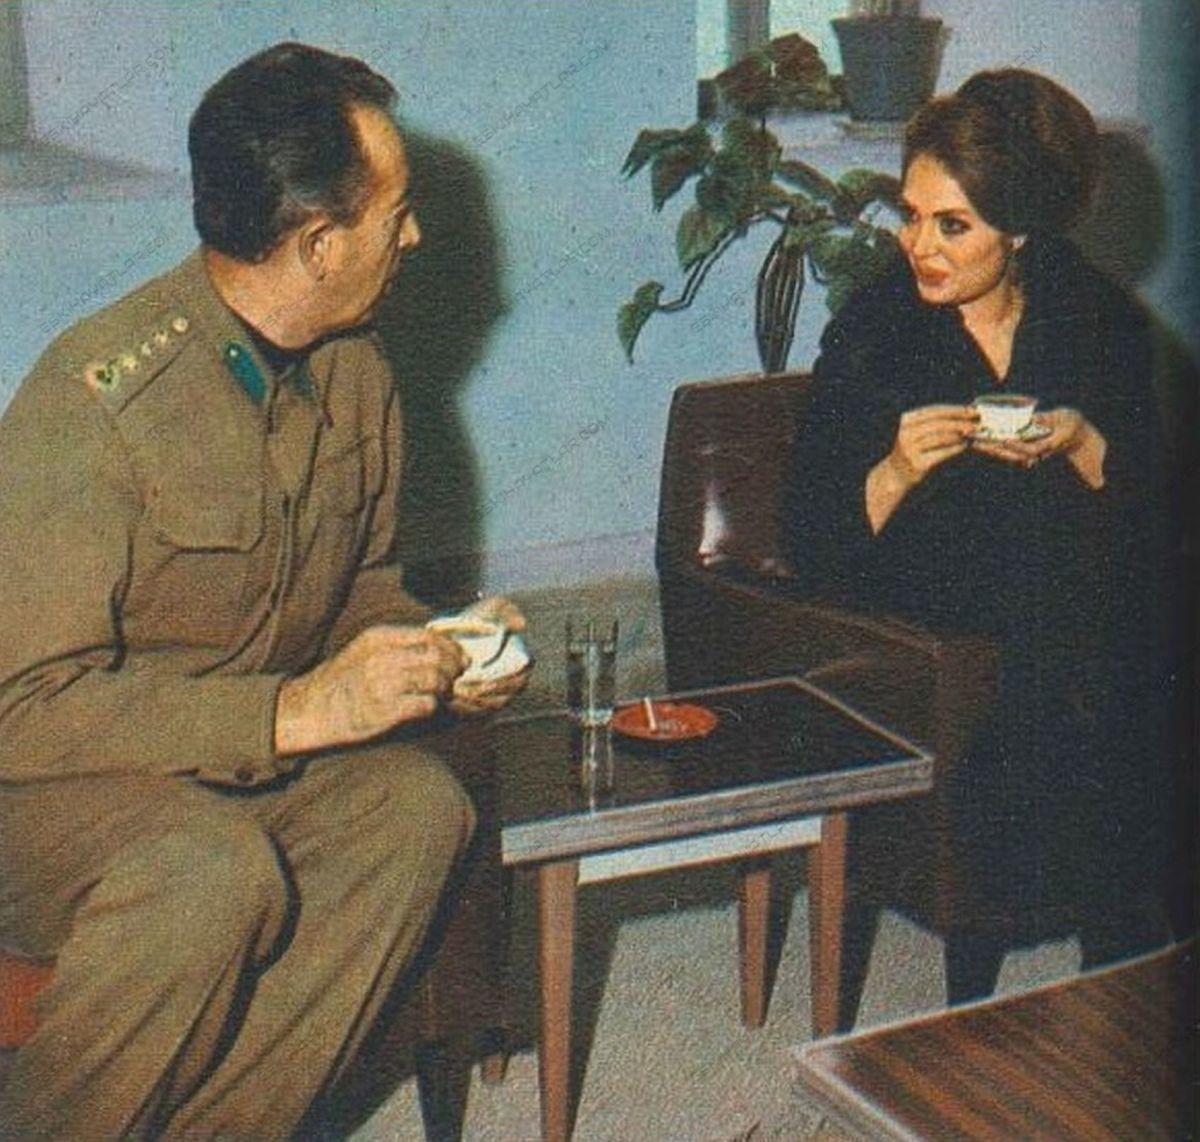 turkan-soray-davutpasa-kislasinda-mehmetcik-ziyaretinde-1971-hayat-dergisi (4)